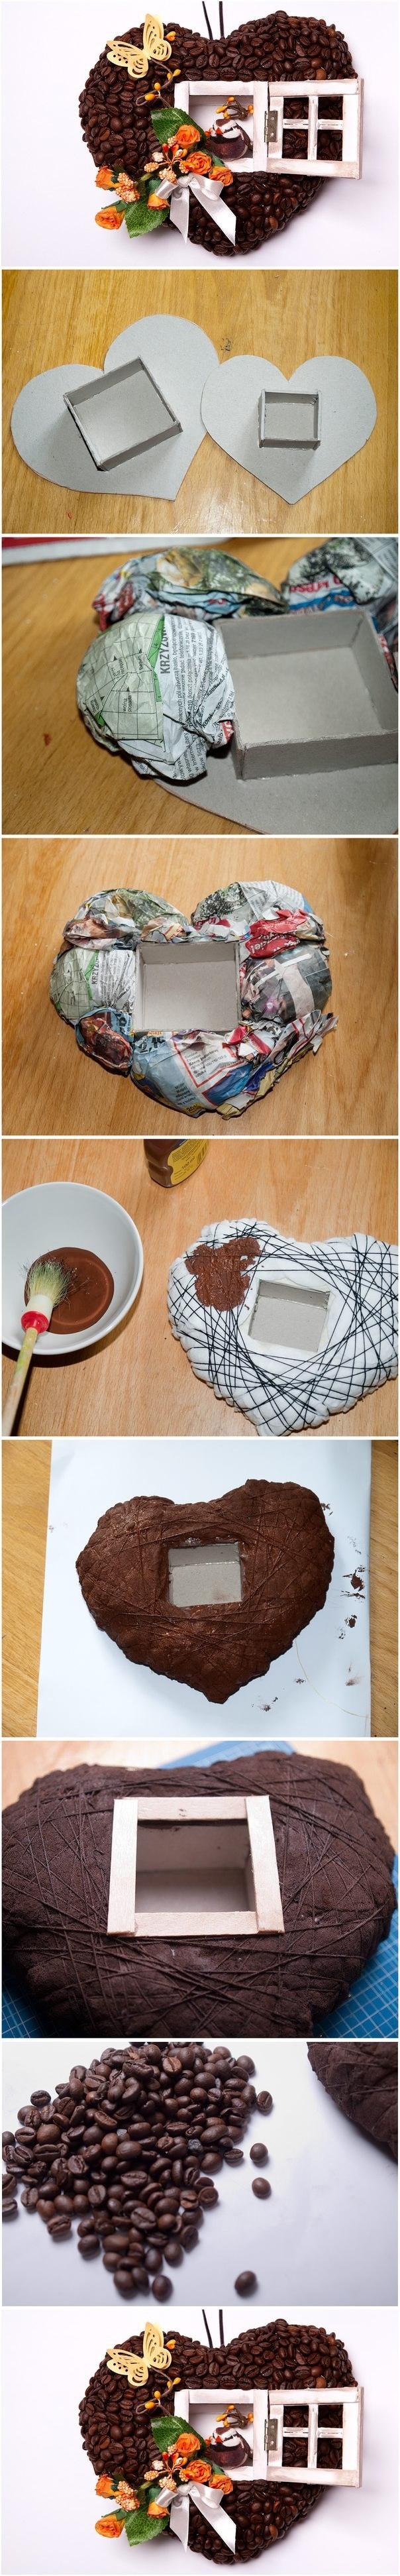 coffeebean heart tutorial